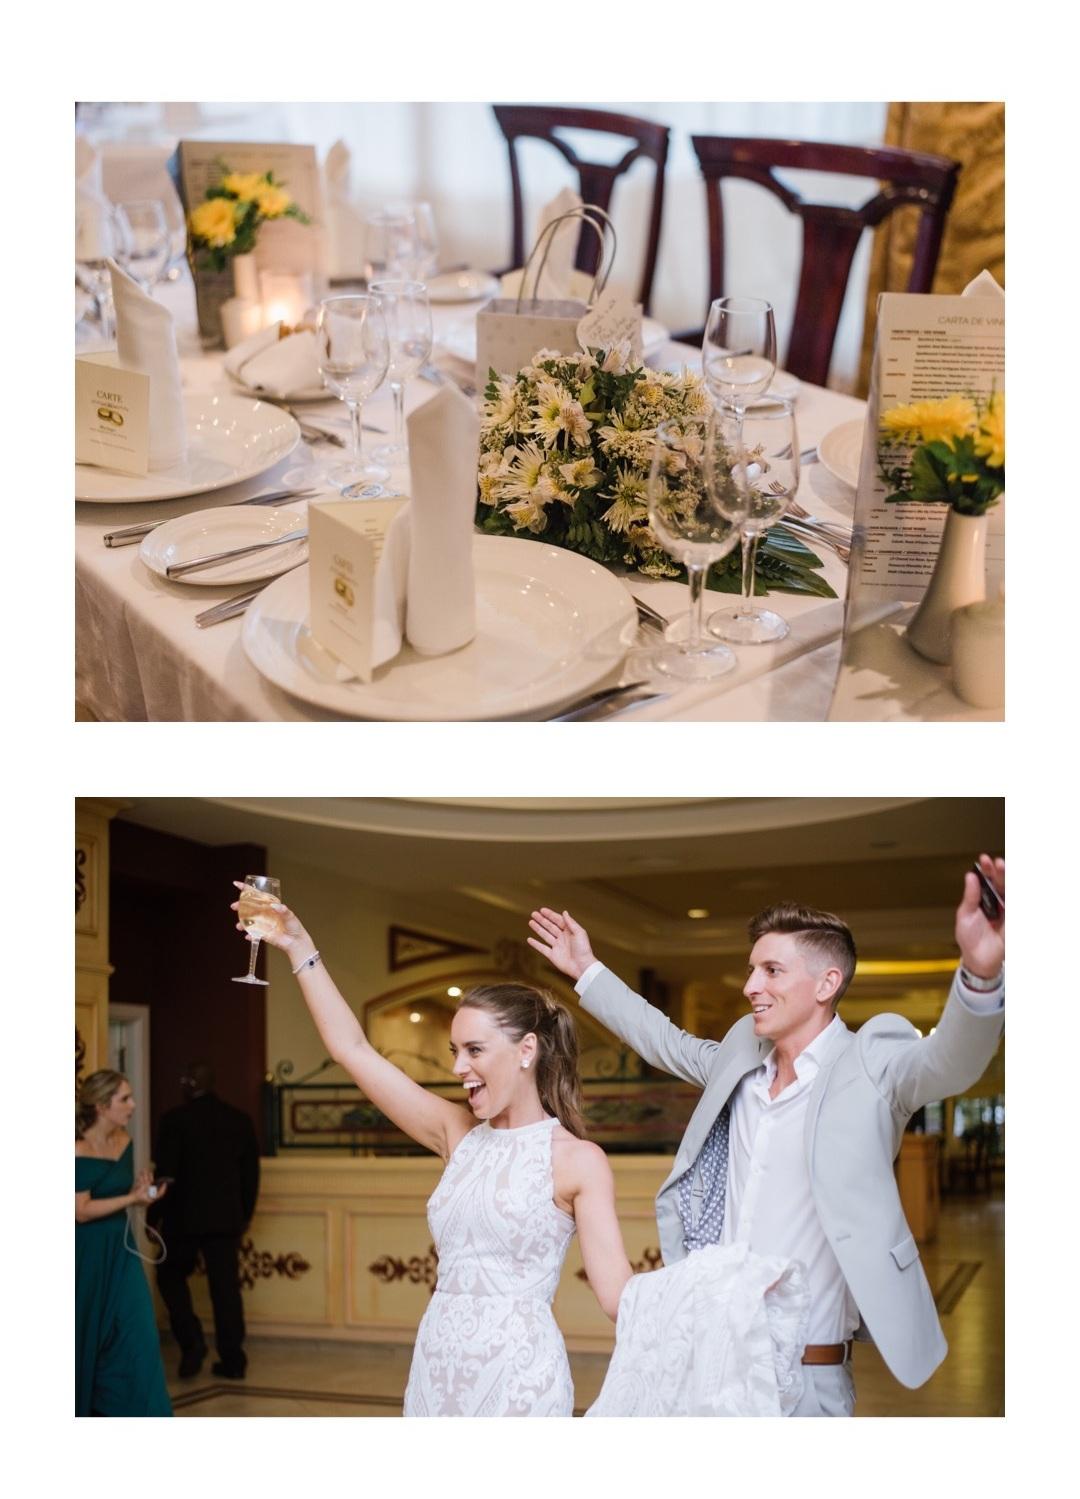 A Colorful Destination Wedding in Punta Cana, Dominican Republic | Halifax Wedding Photographer